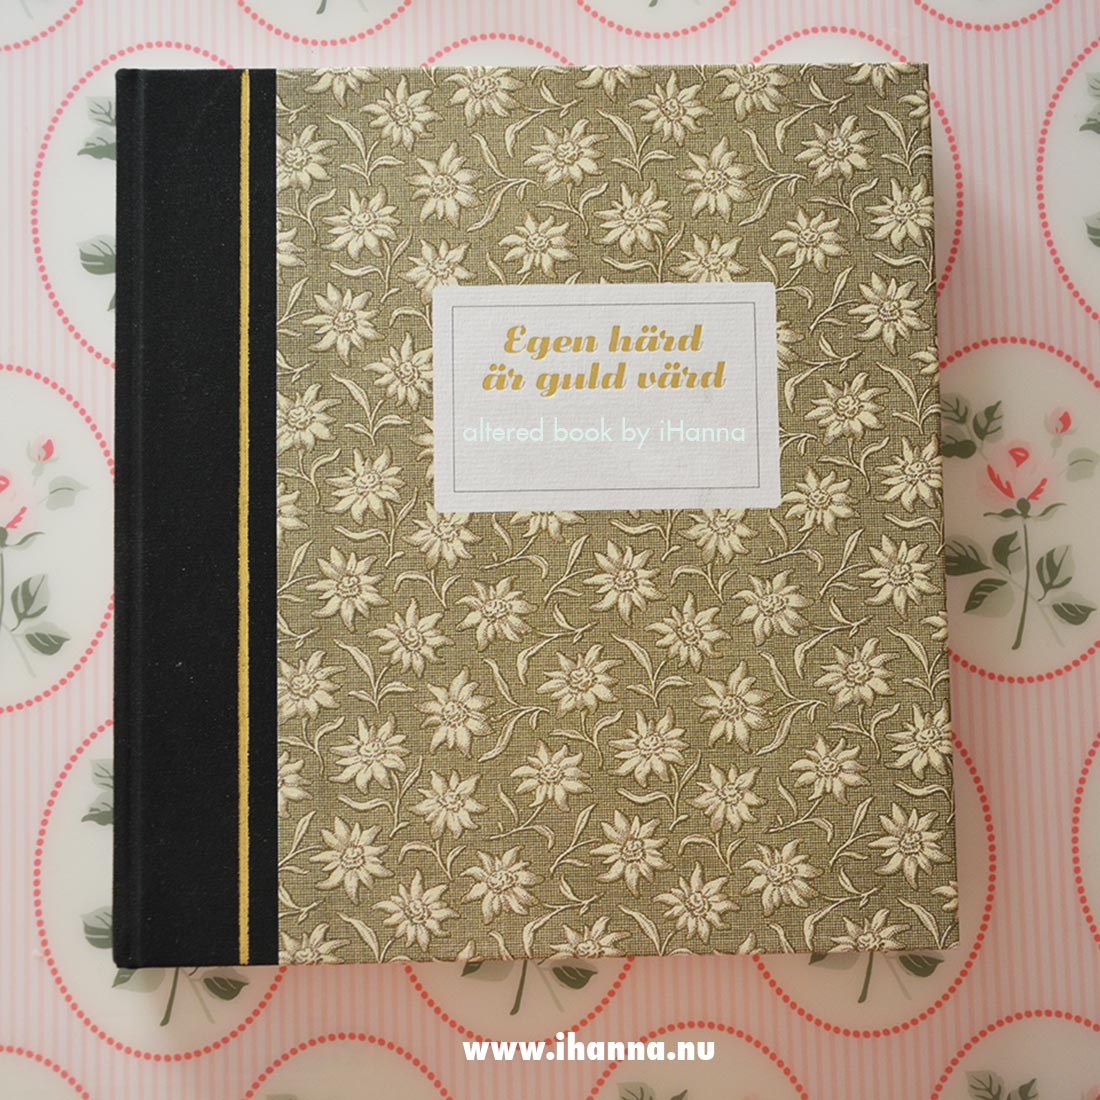 Egen härd är guld värd - My altered book for 2021 that will now be my Art Journal